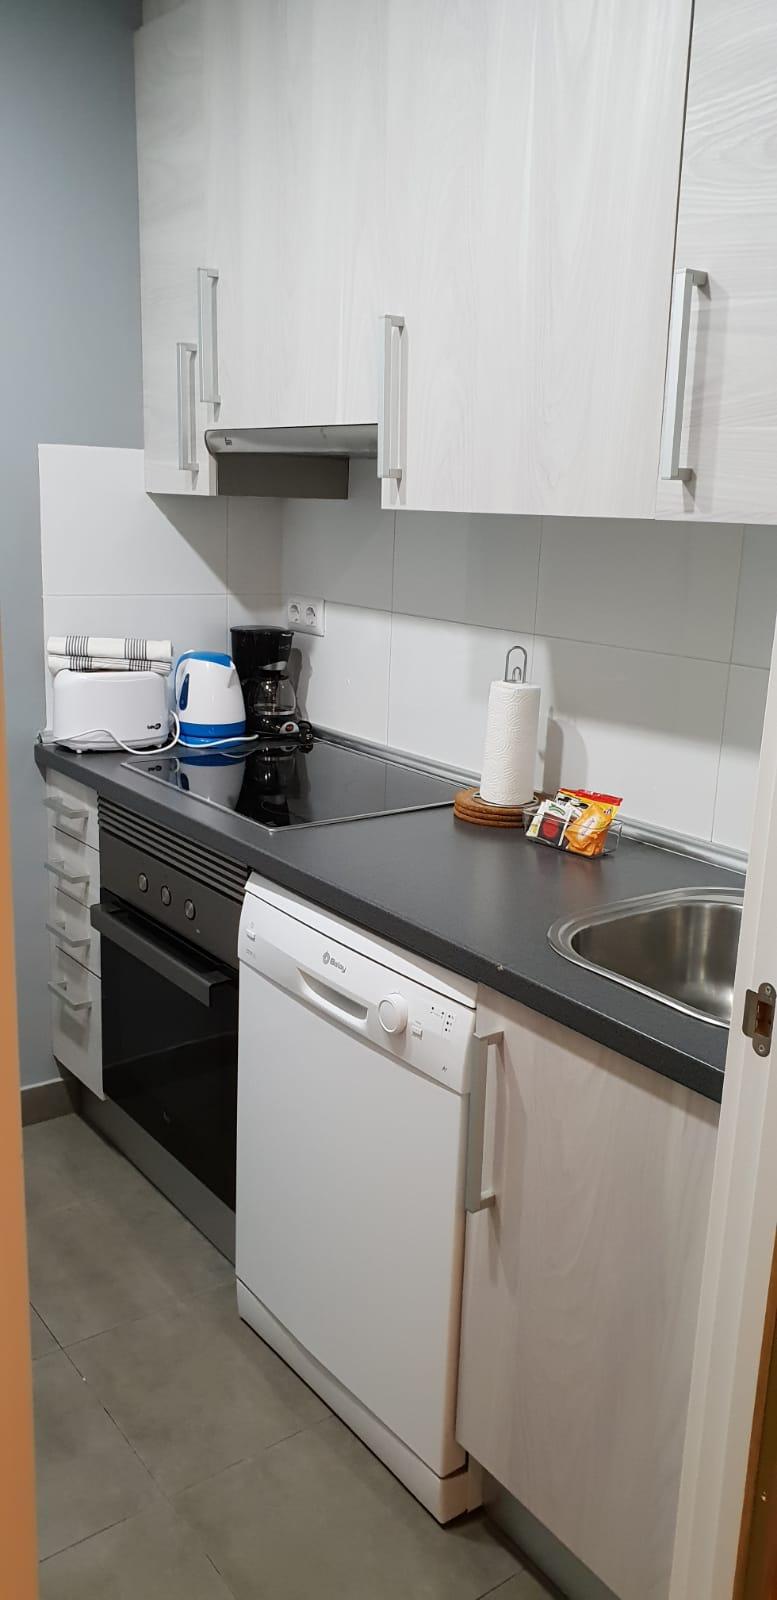 Kitchen at Goya 34 Apartment - Citybase Apartments